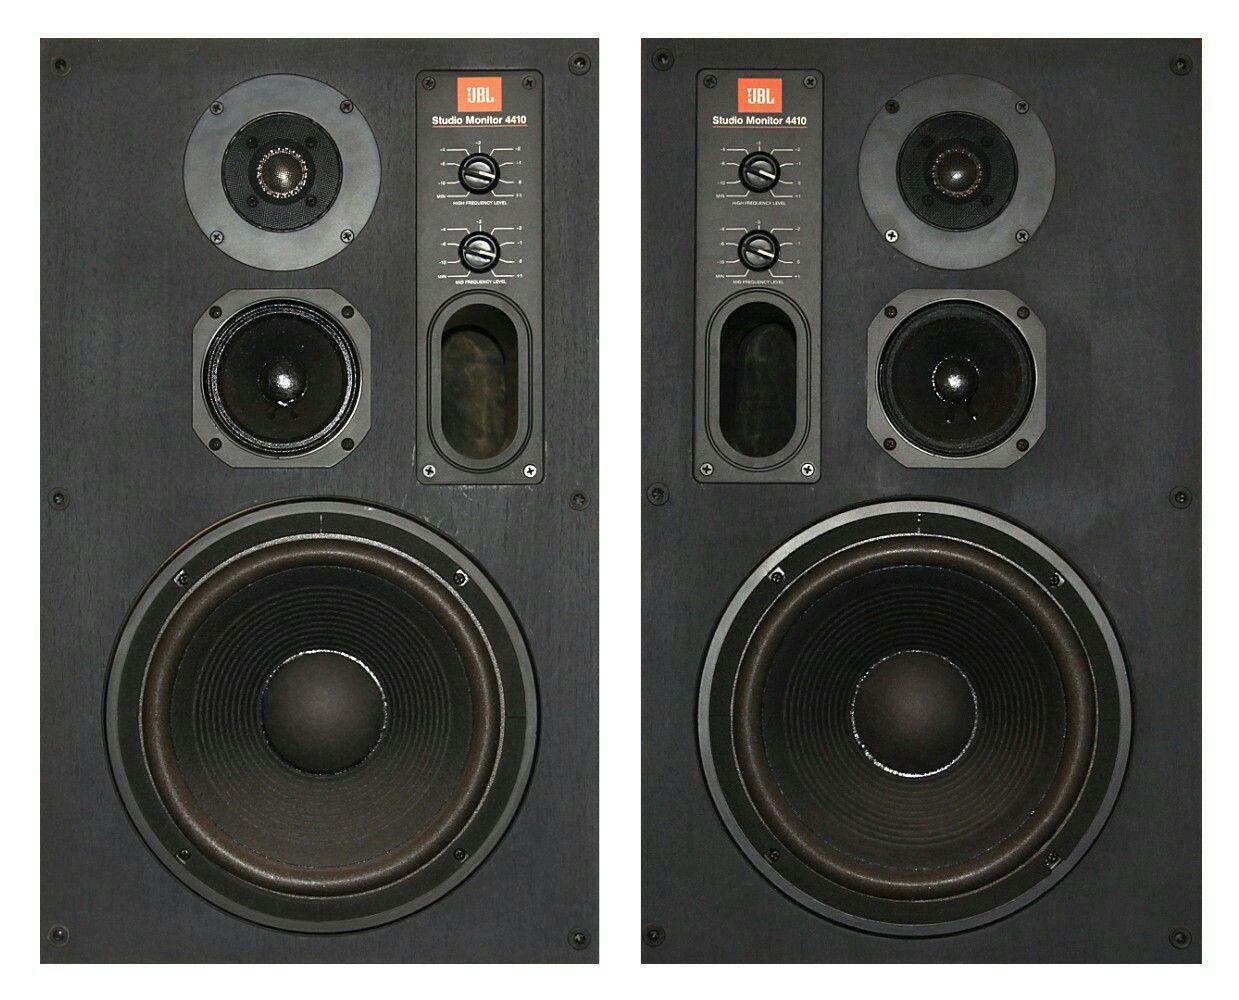 JBL 4410 monitors   Professional Audio   Pinterest   Loudspeaker